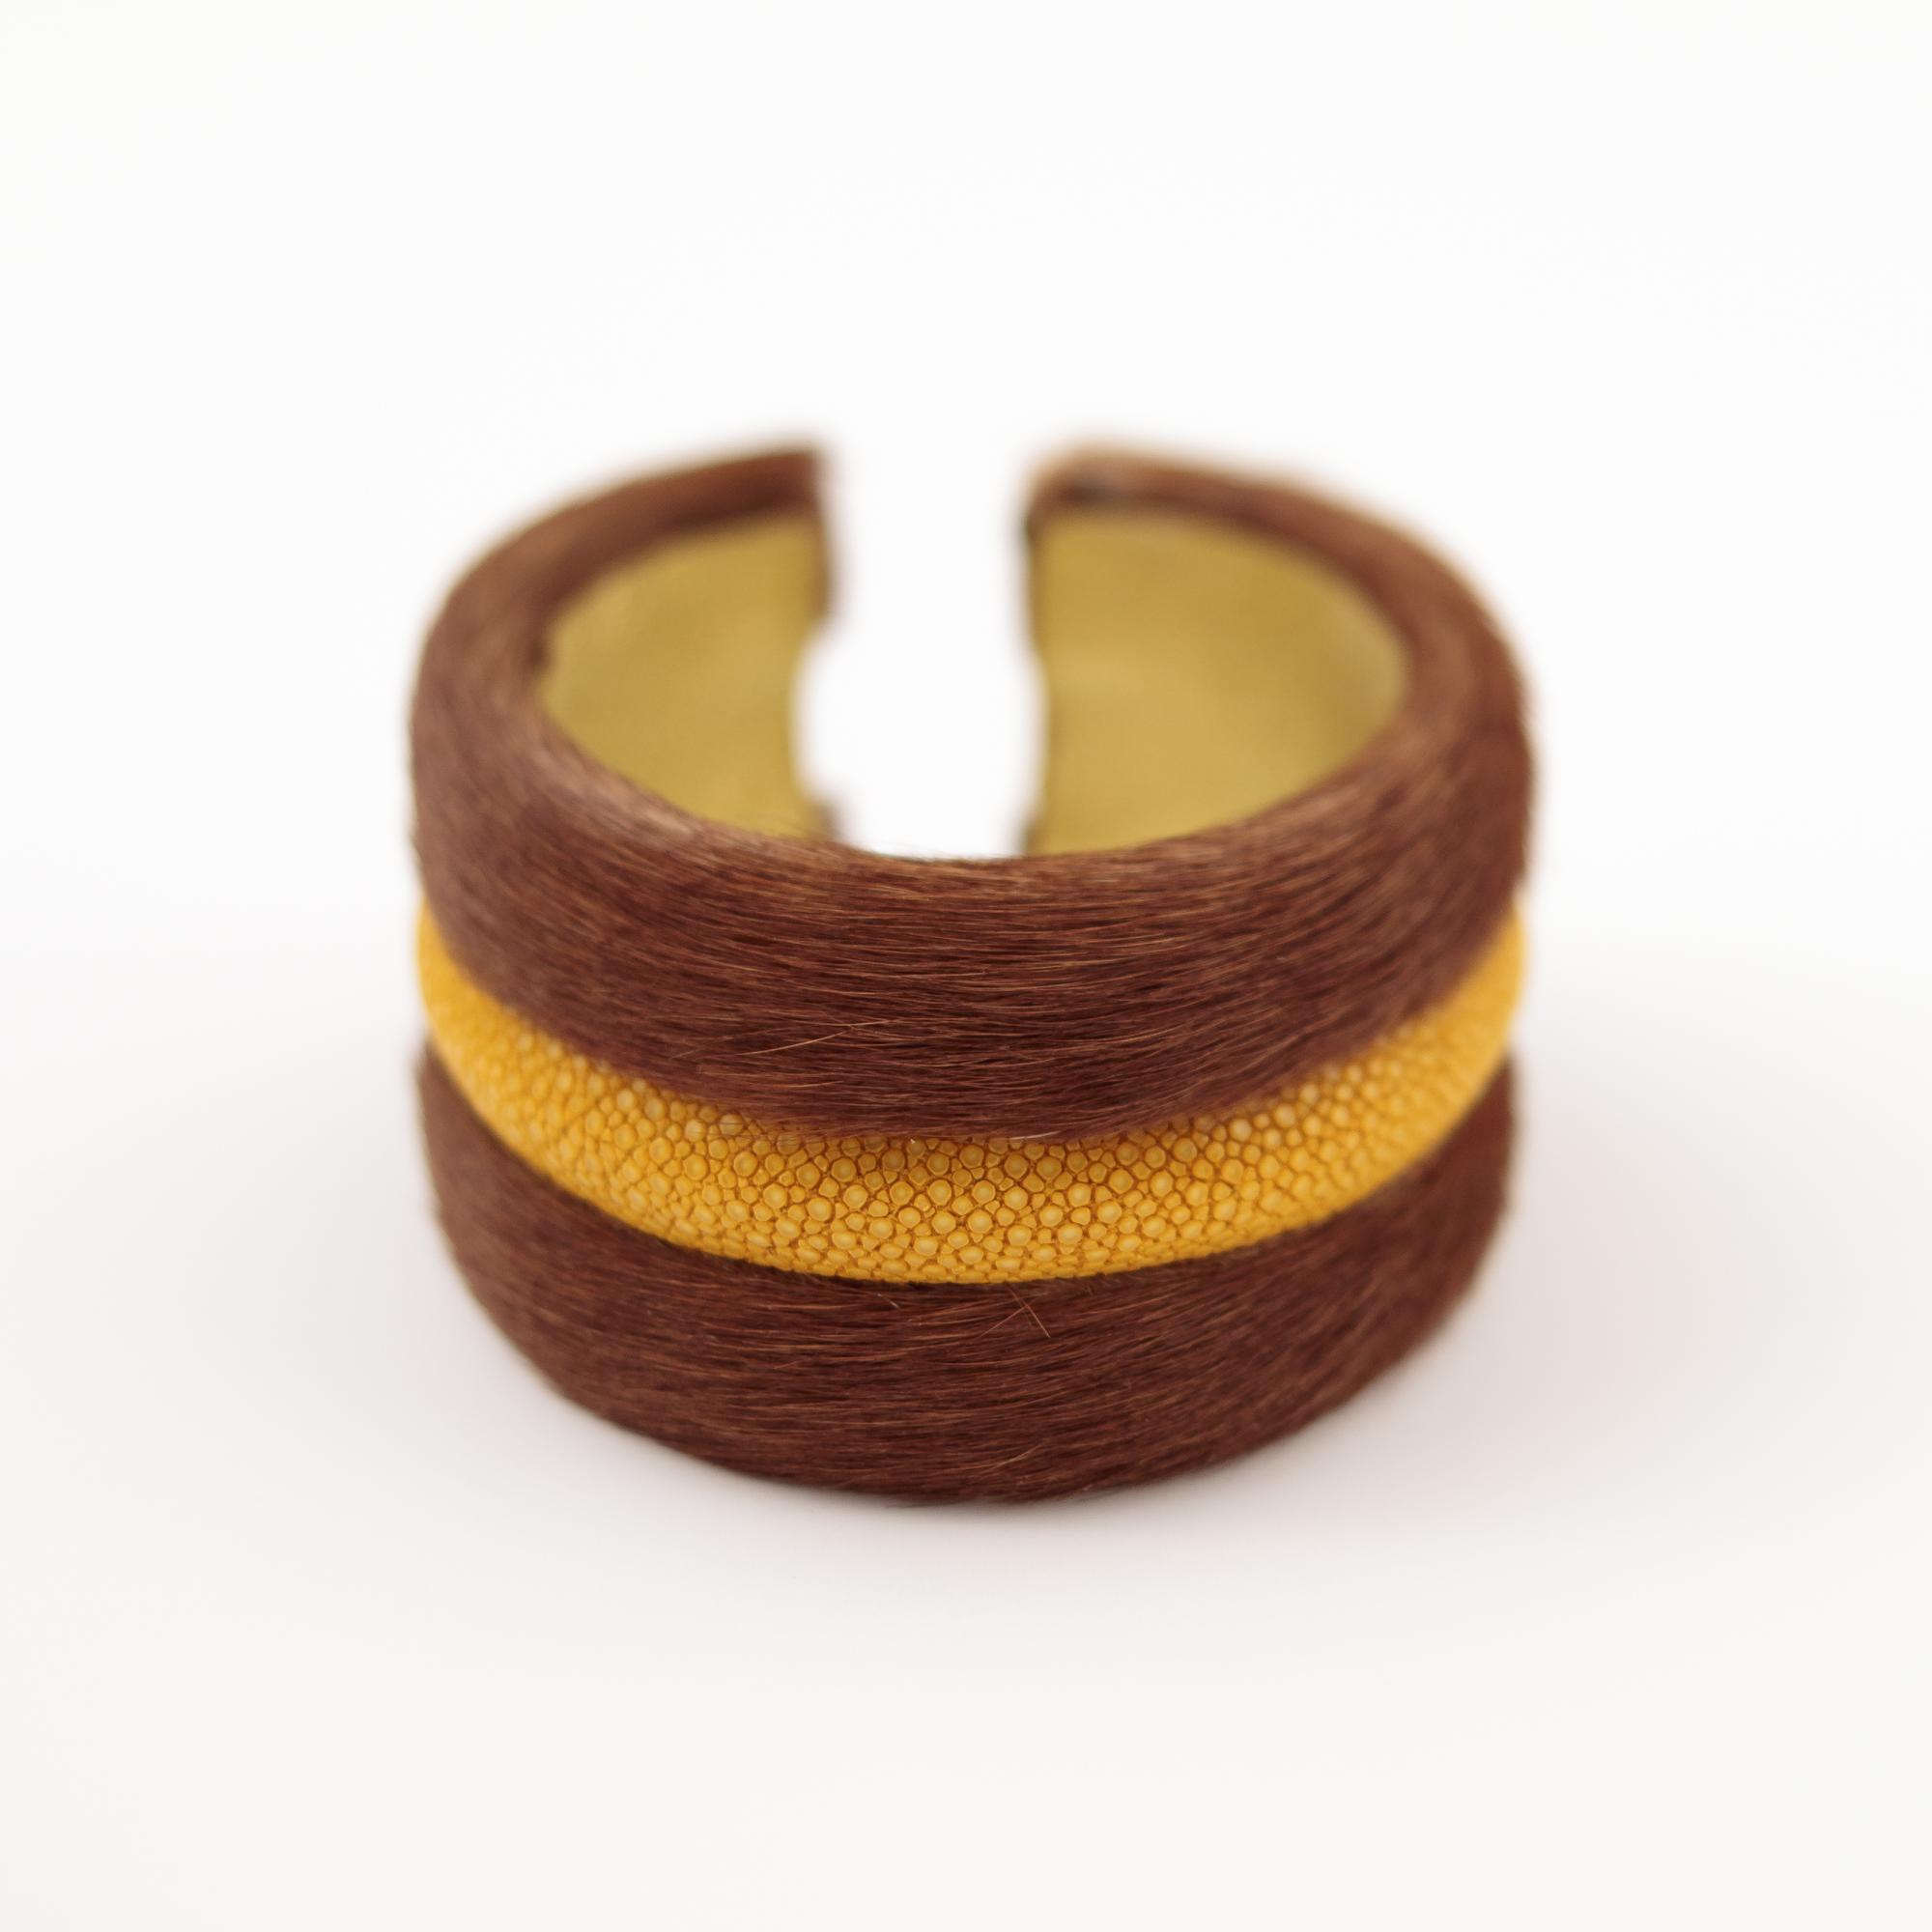 tresor-by-flore-galuchat-bracelet-poilu-marron-jaune